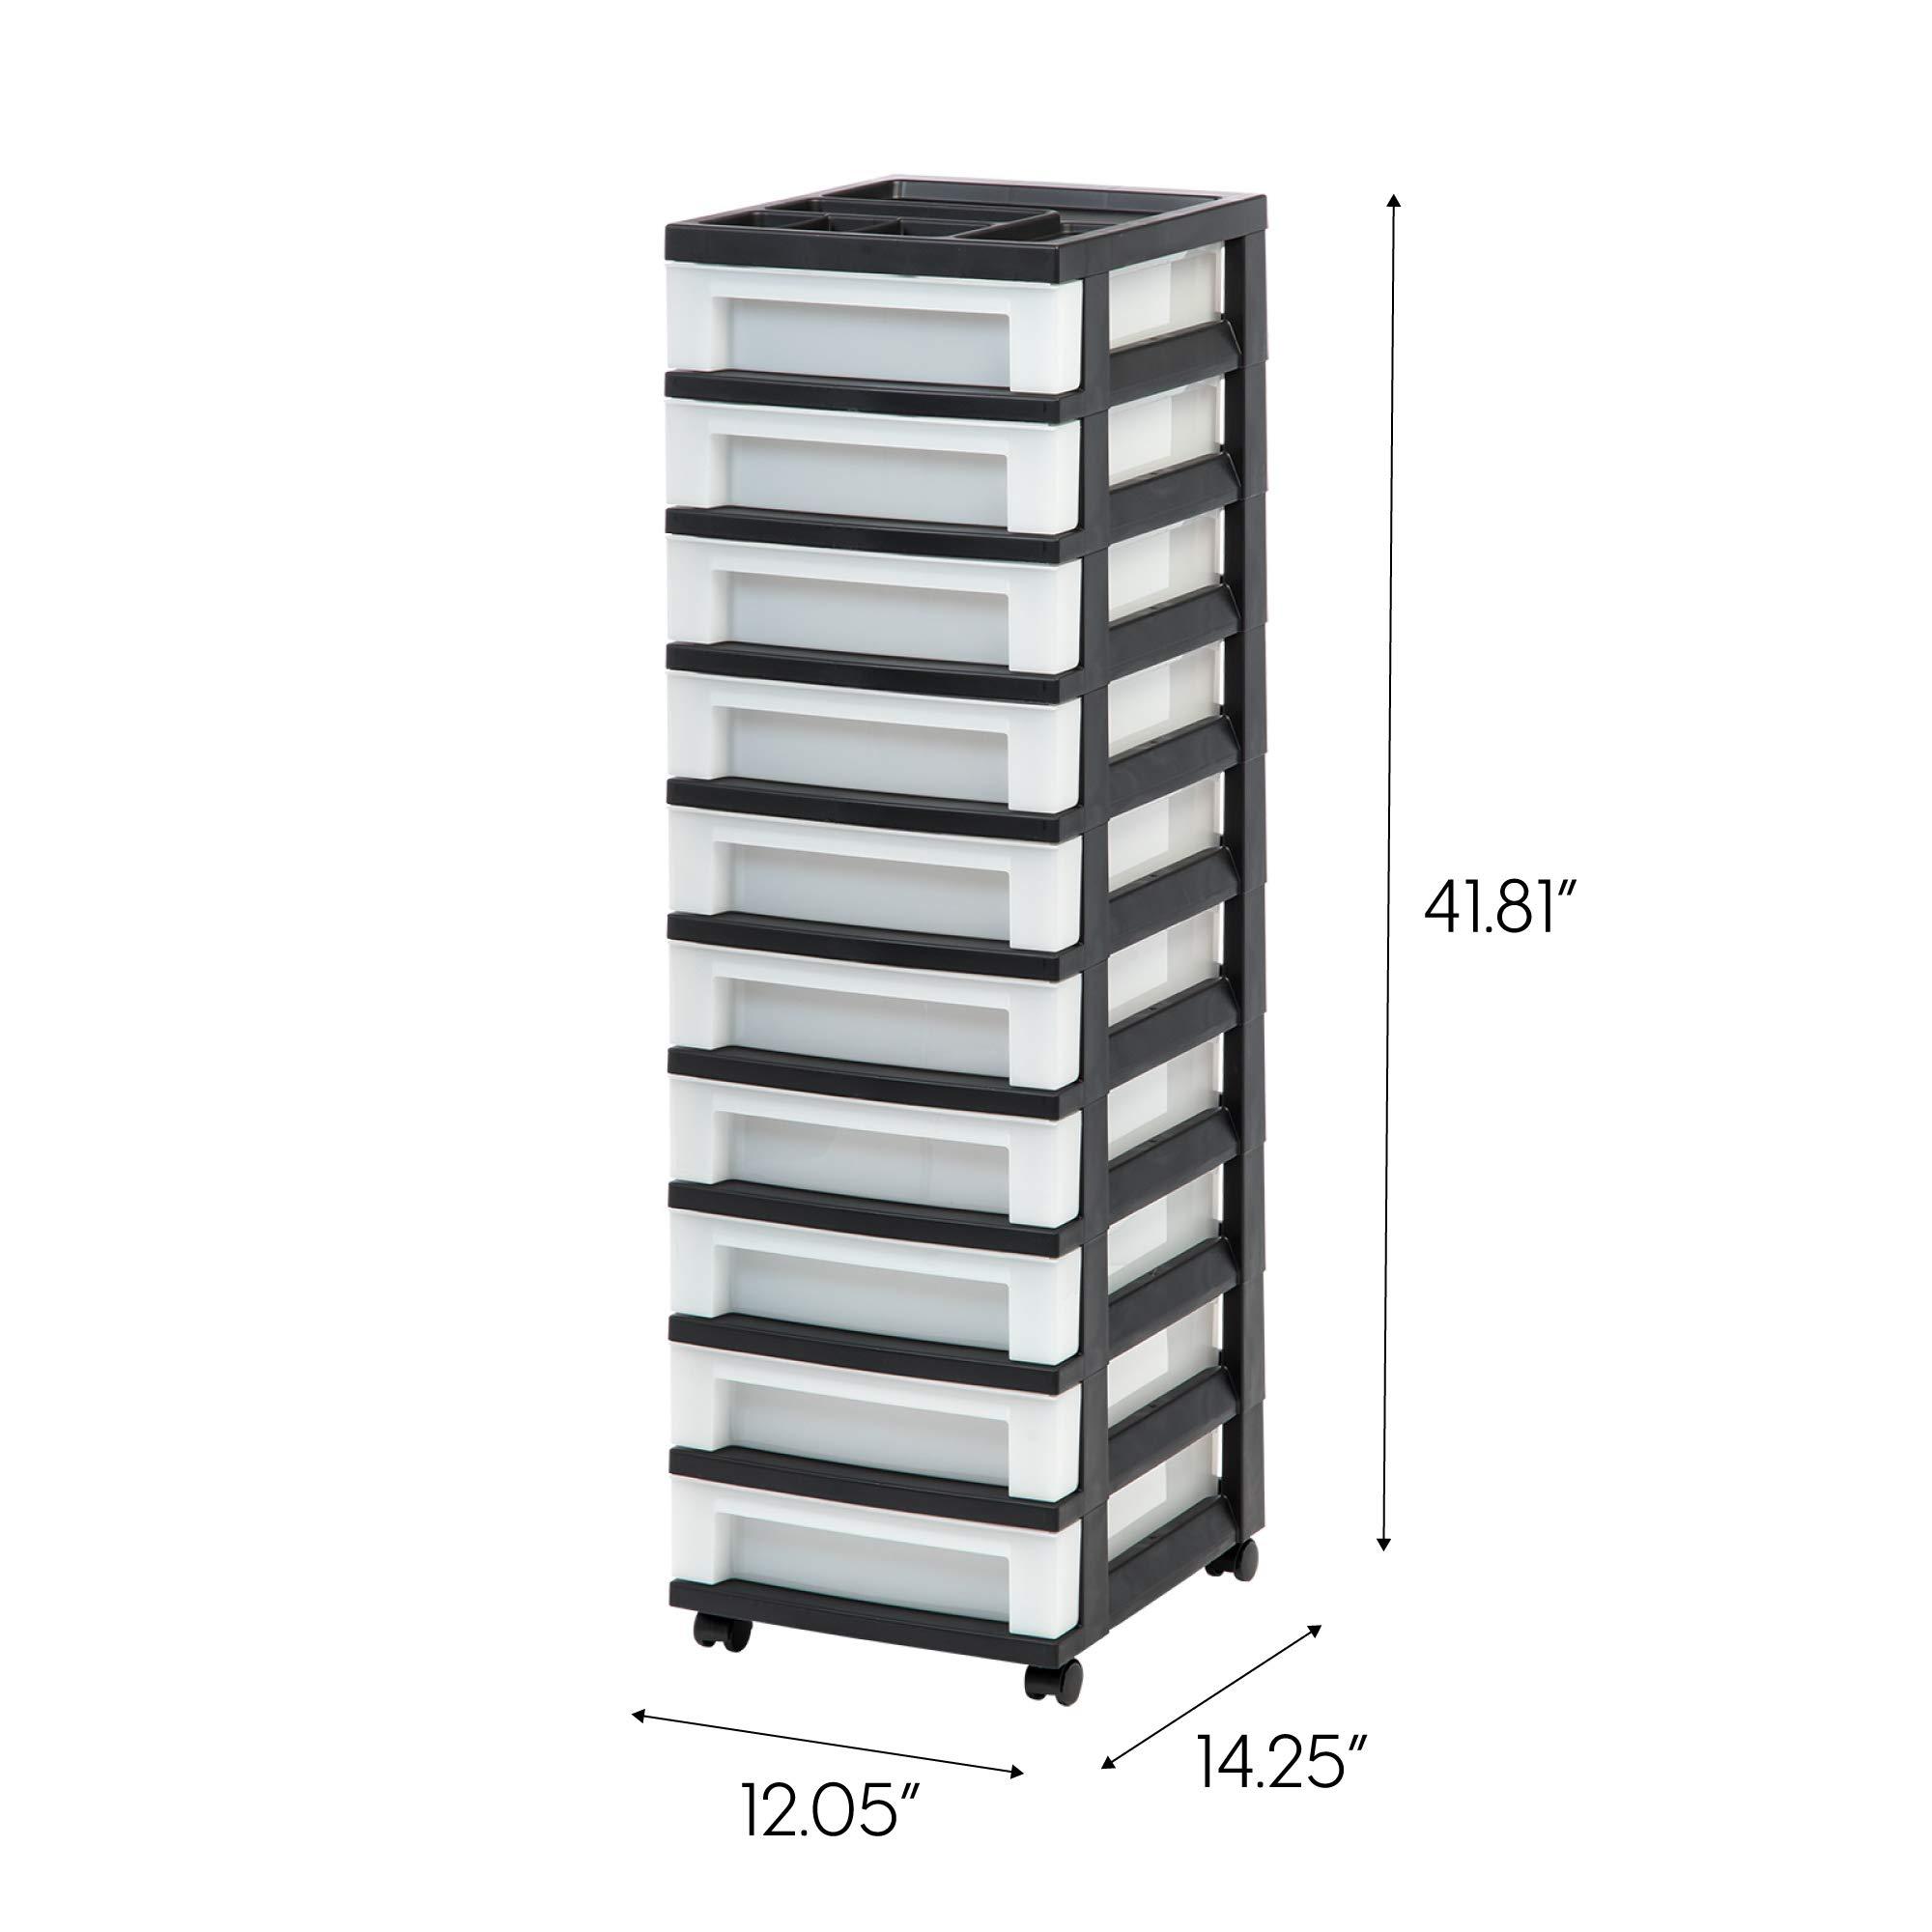 IRIS USA, Inc. MC-3100-TOP 10-Drawer Cart with Organizer Top, Black/Pearl by IRIS USA, Inc.